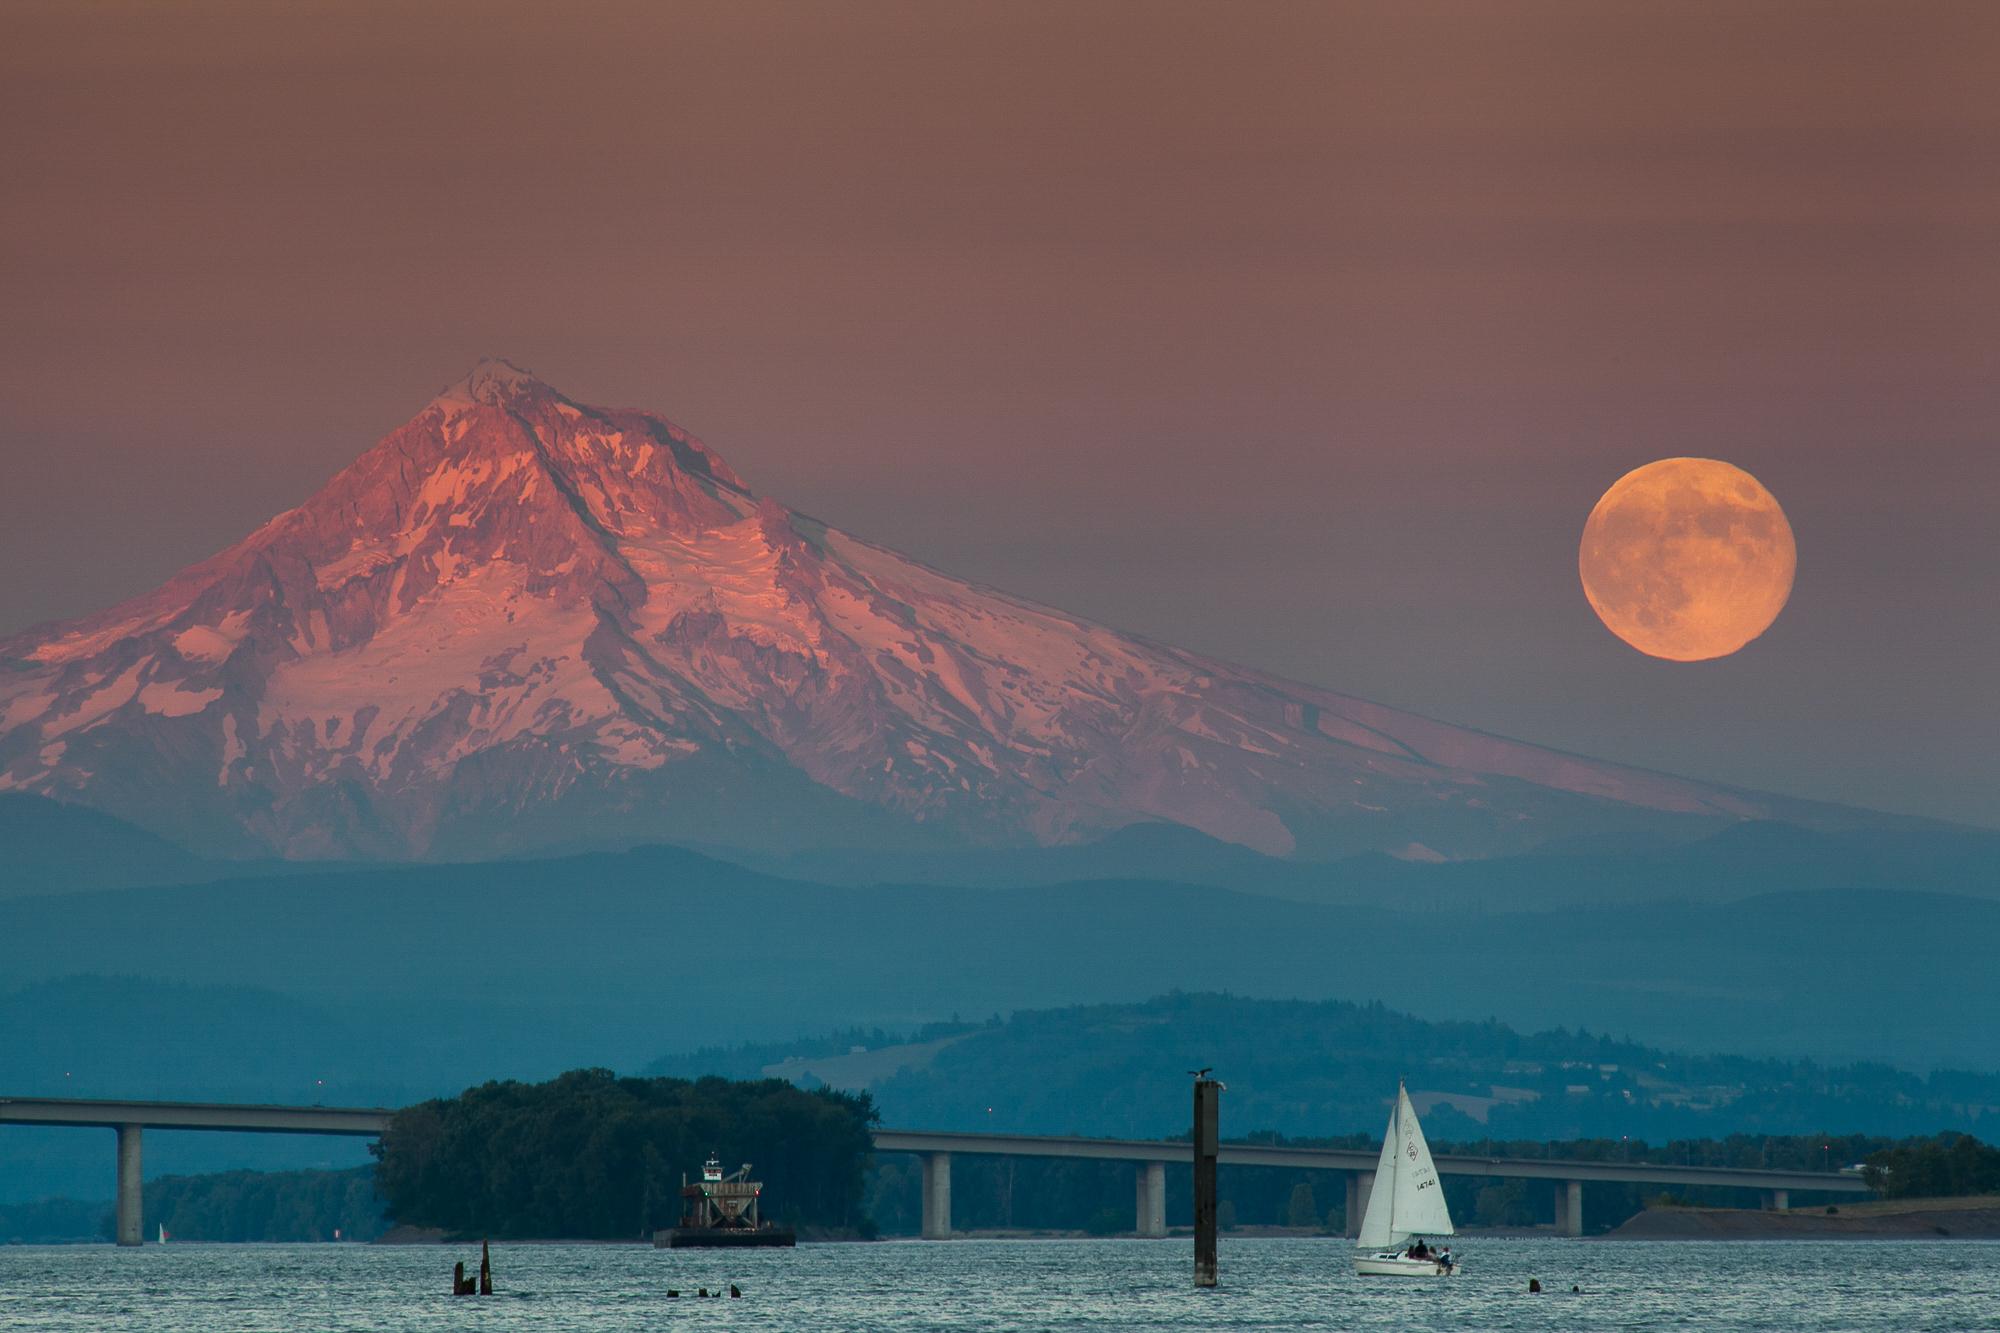 032Travel_Adventure_Photography_Outlive_Creative_Oregon_Mount_Hood.jpg